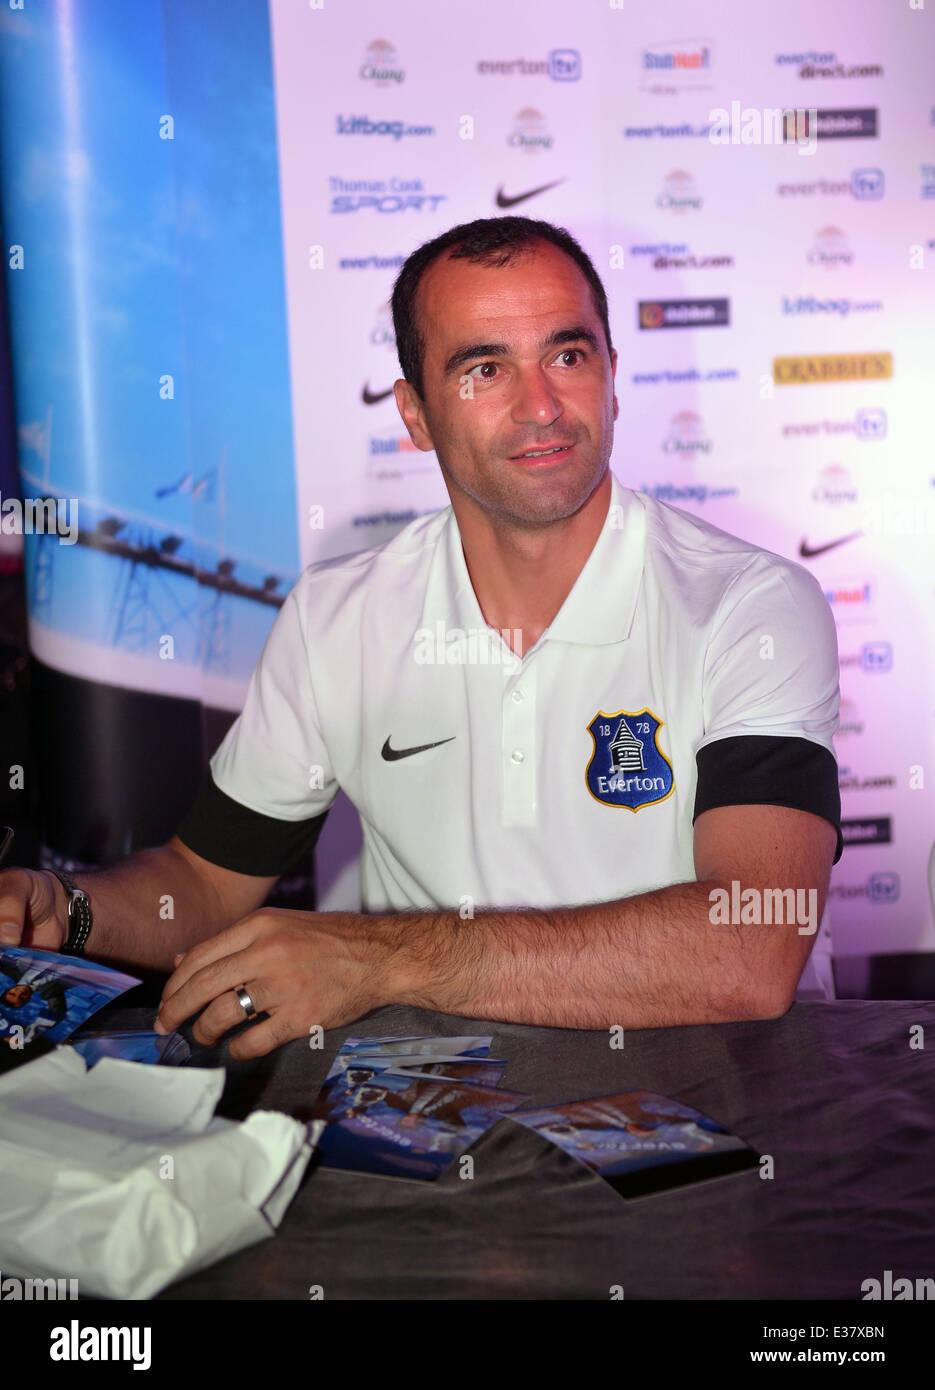 Everton Football Club meet and greet in Miami  Featuring: Roberto Martinez Where: Miami Beach, Florida, United States - Stock Image